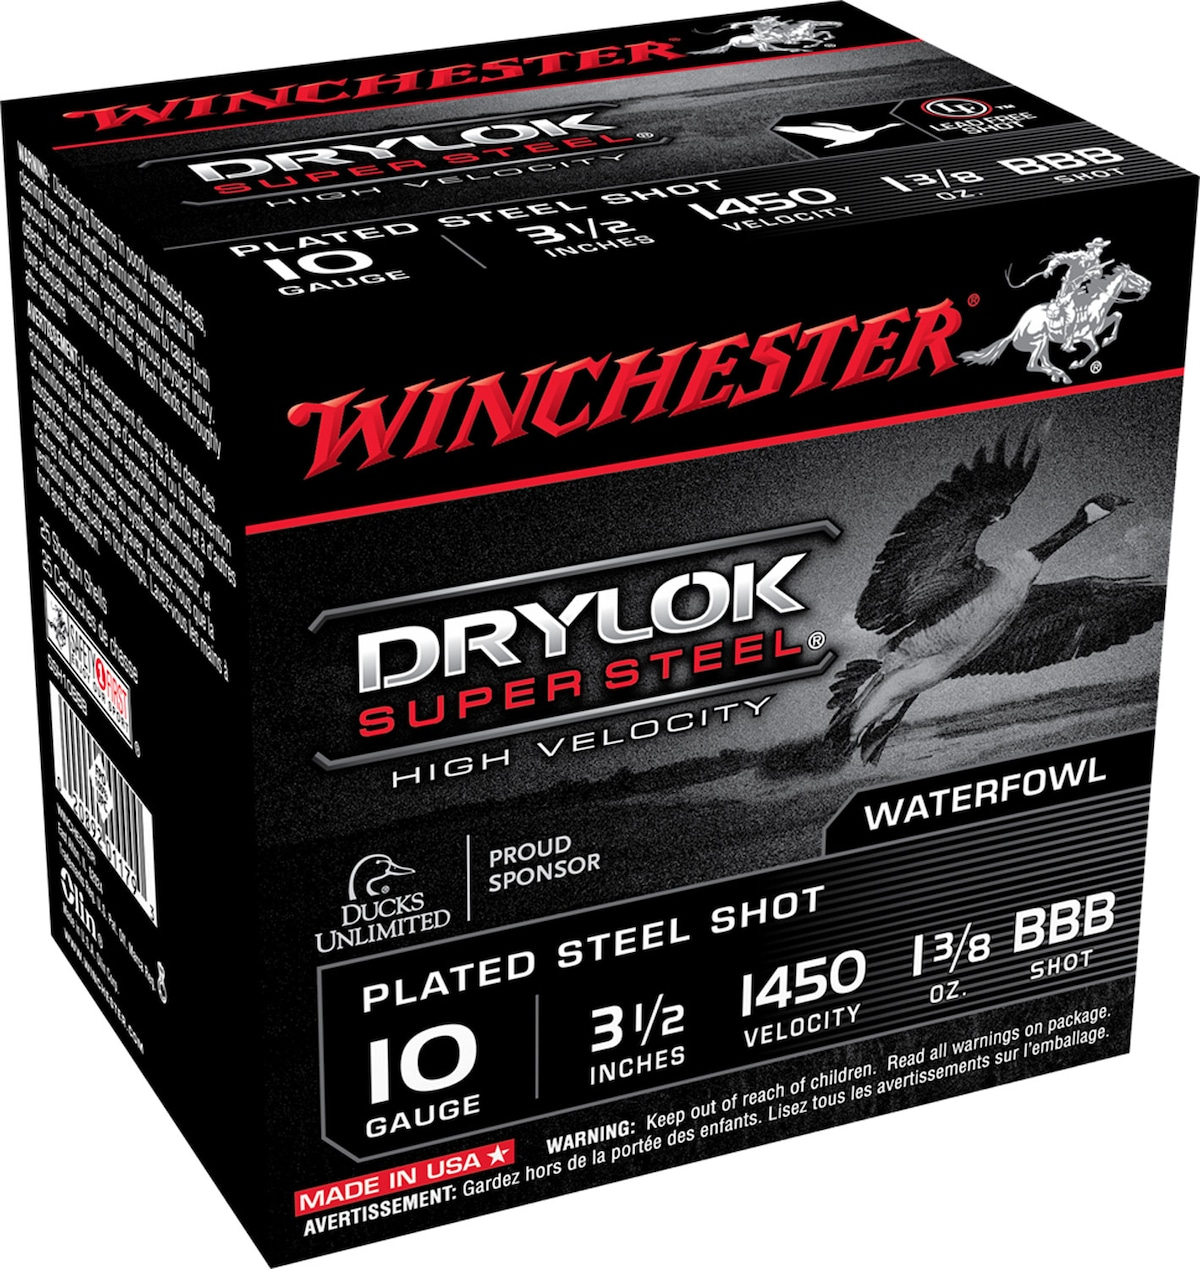 WINCHESTER DRYLOCK SUPER STEEL